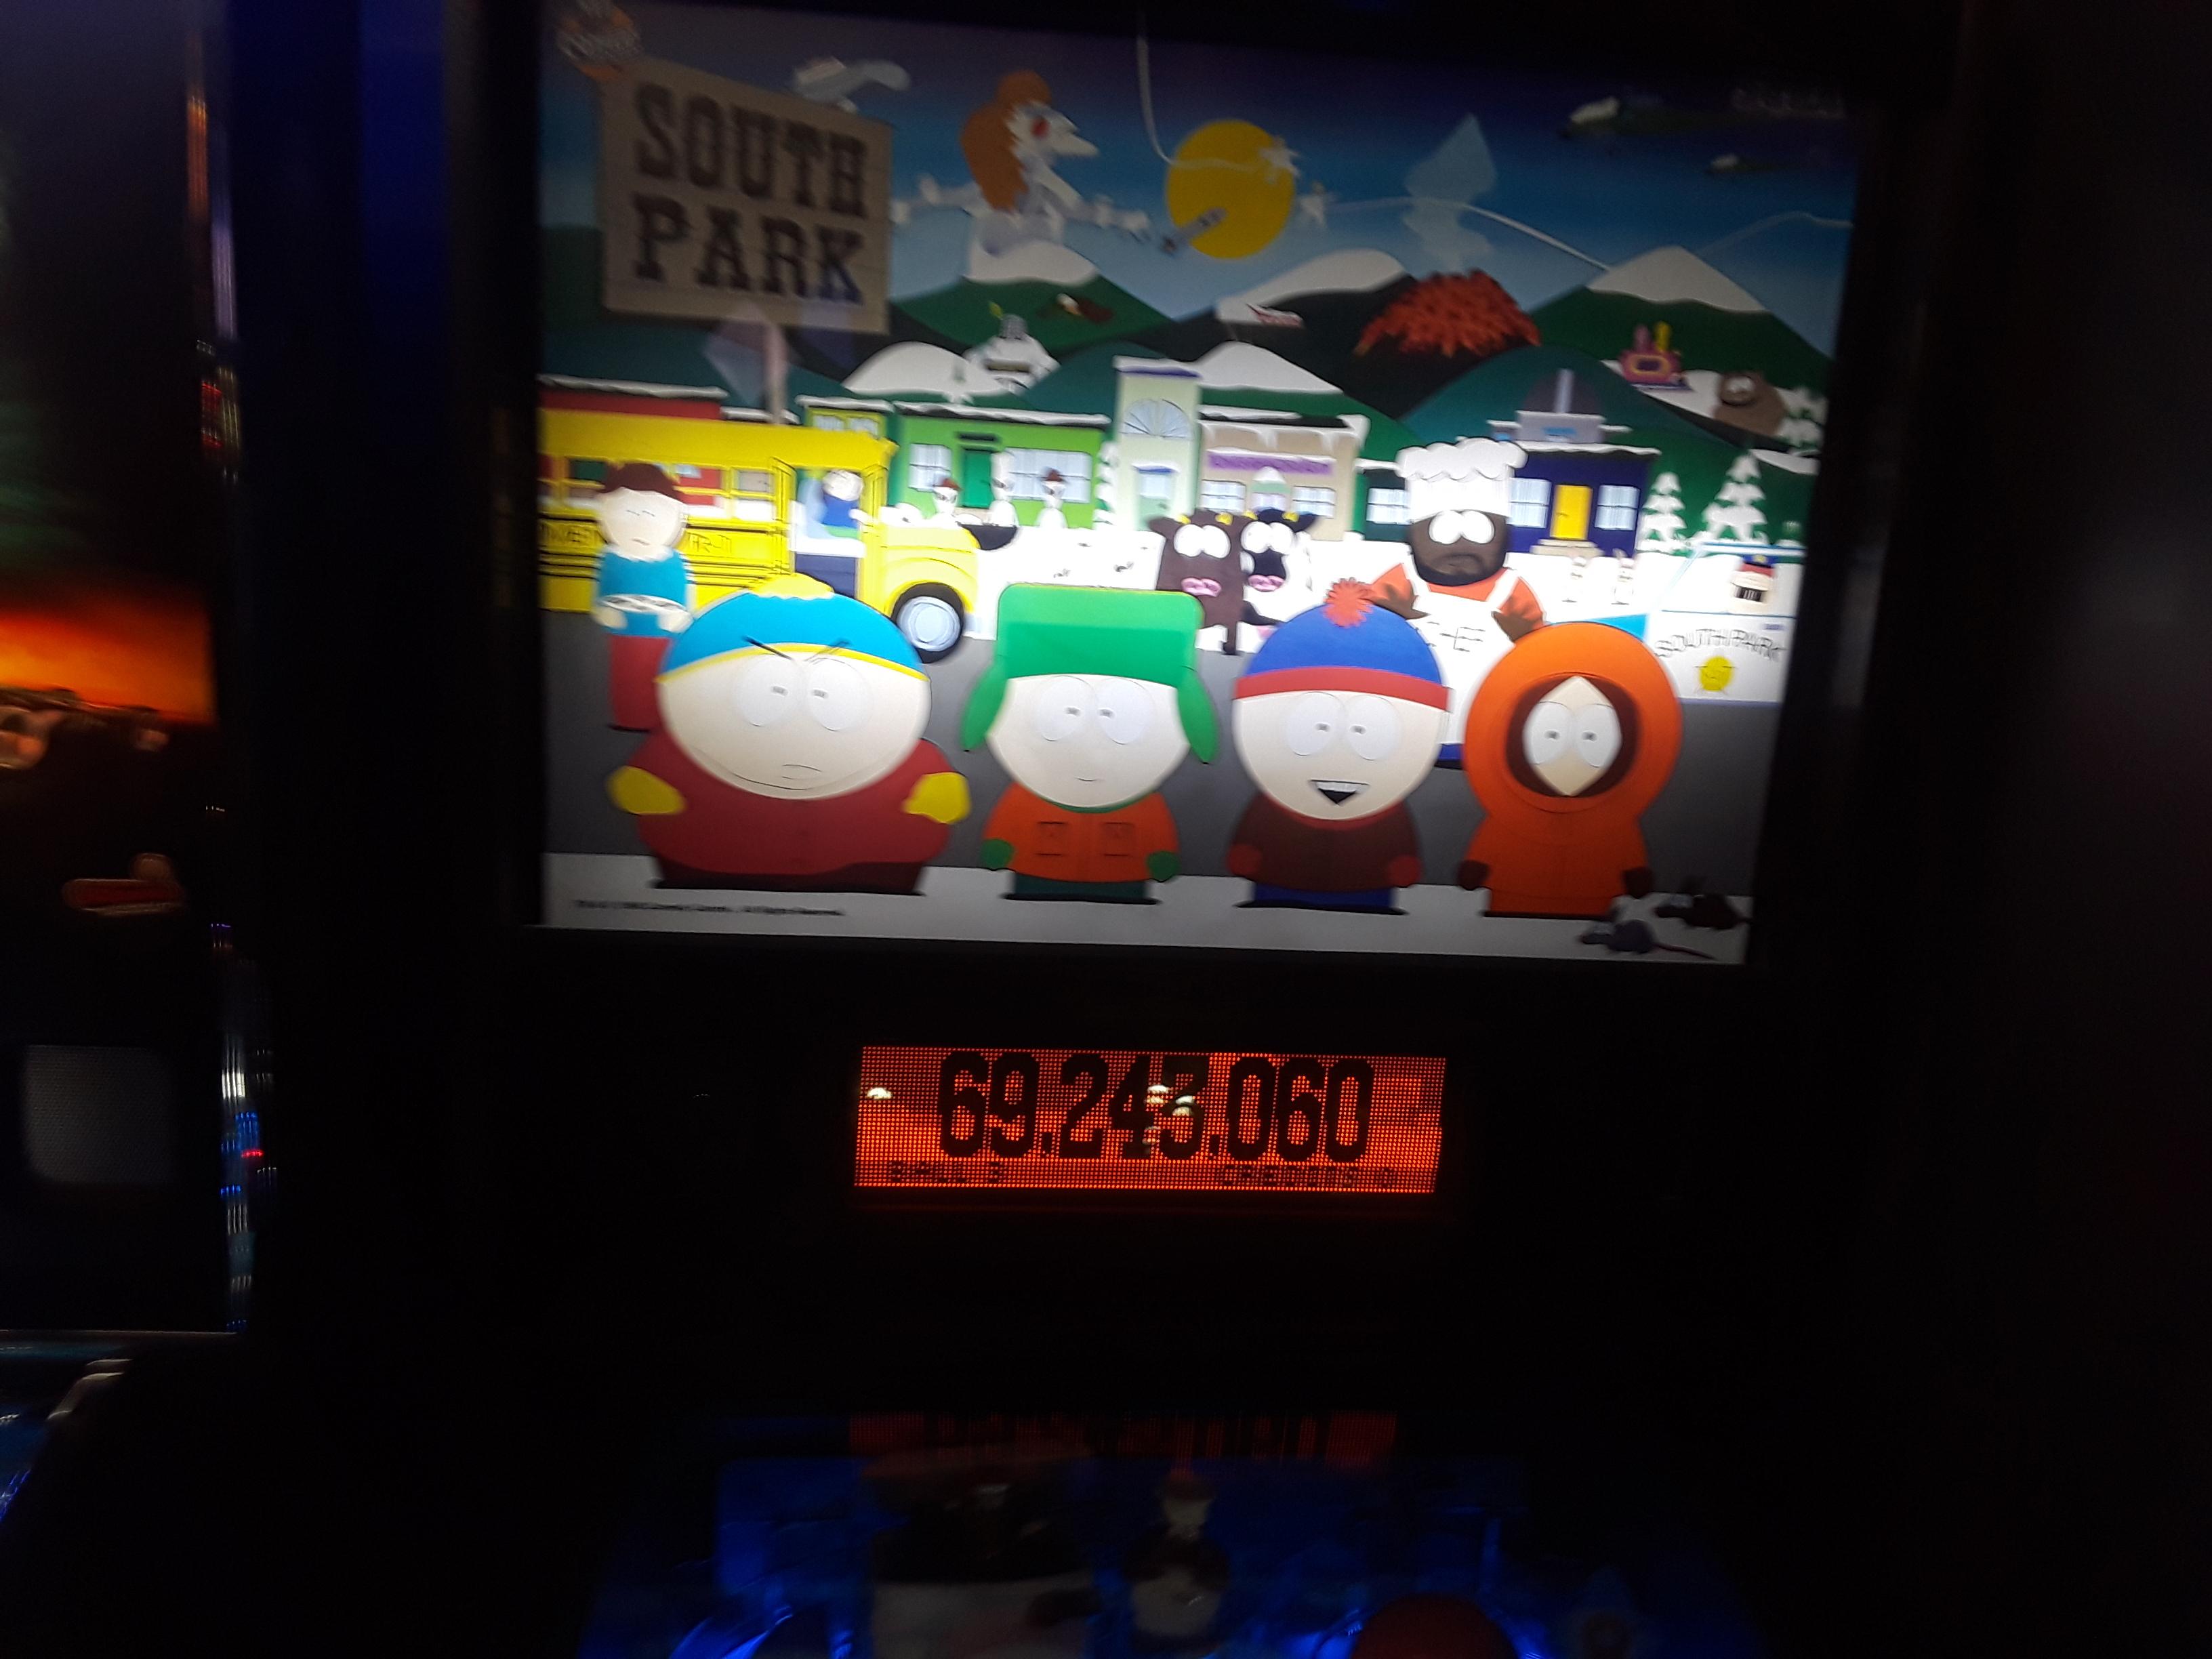 JML101582: South Park (Pinball: 3 Balls) 69,243,060 points on 2019-02-16 04:18:02